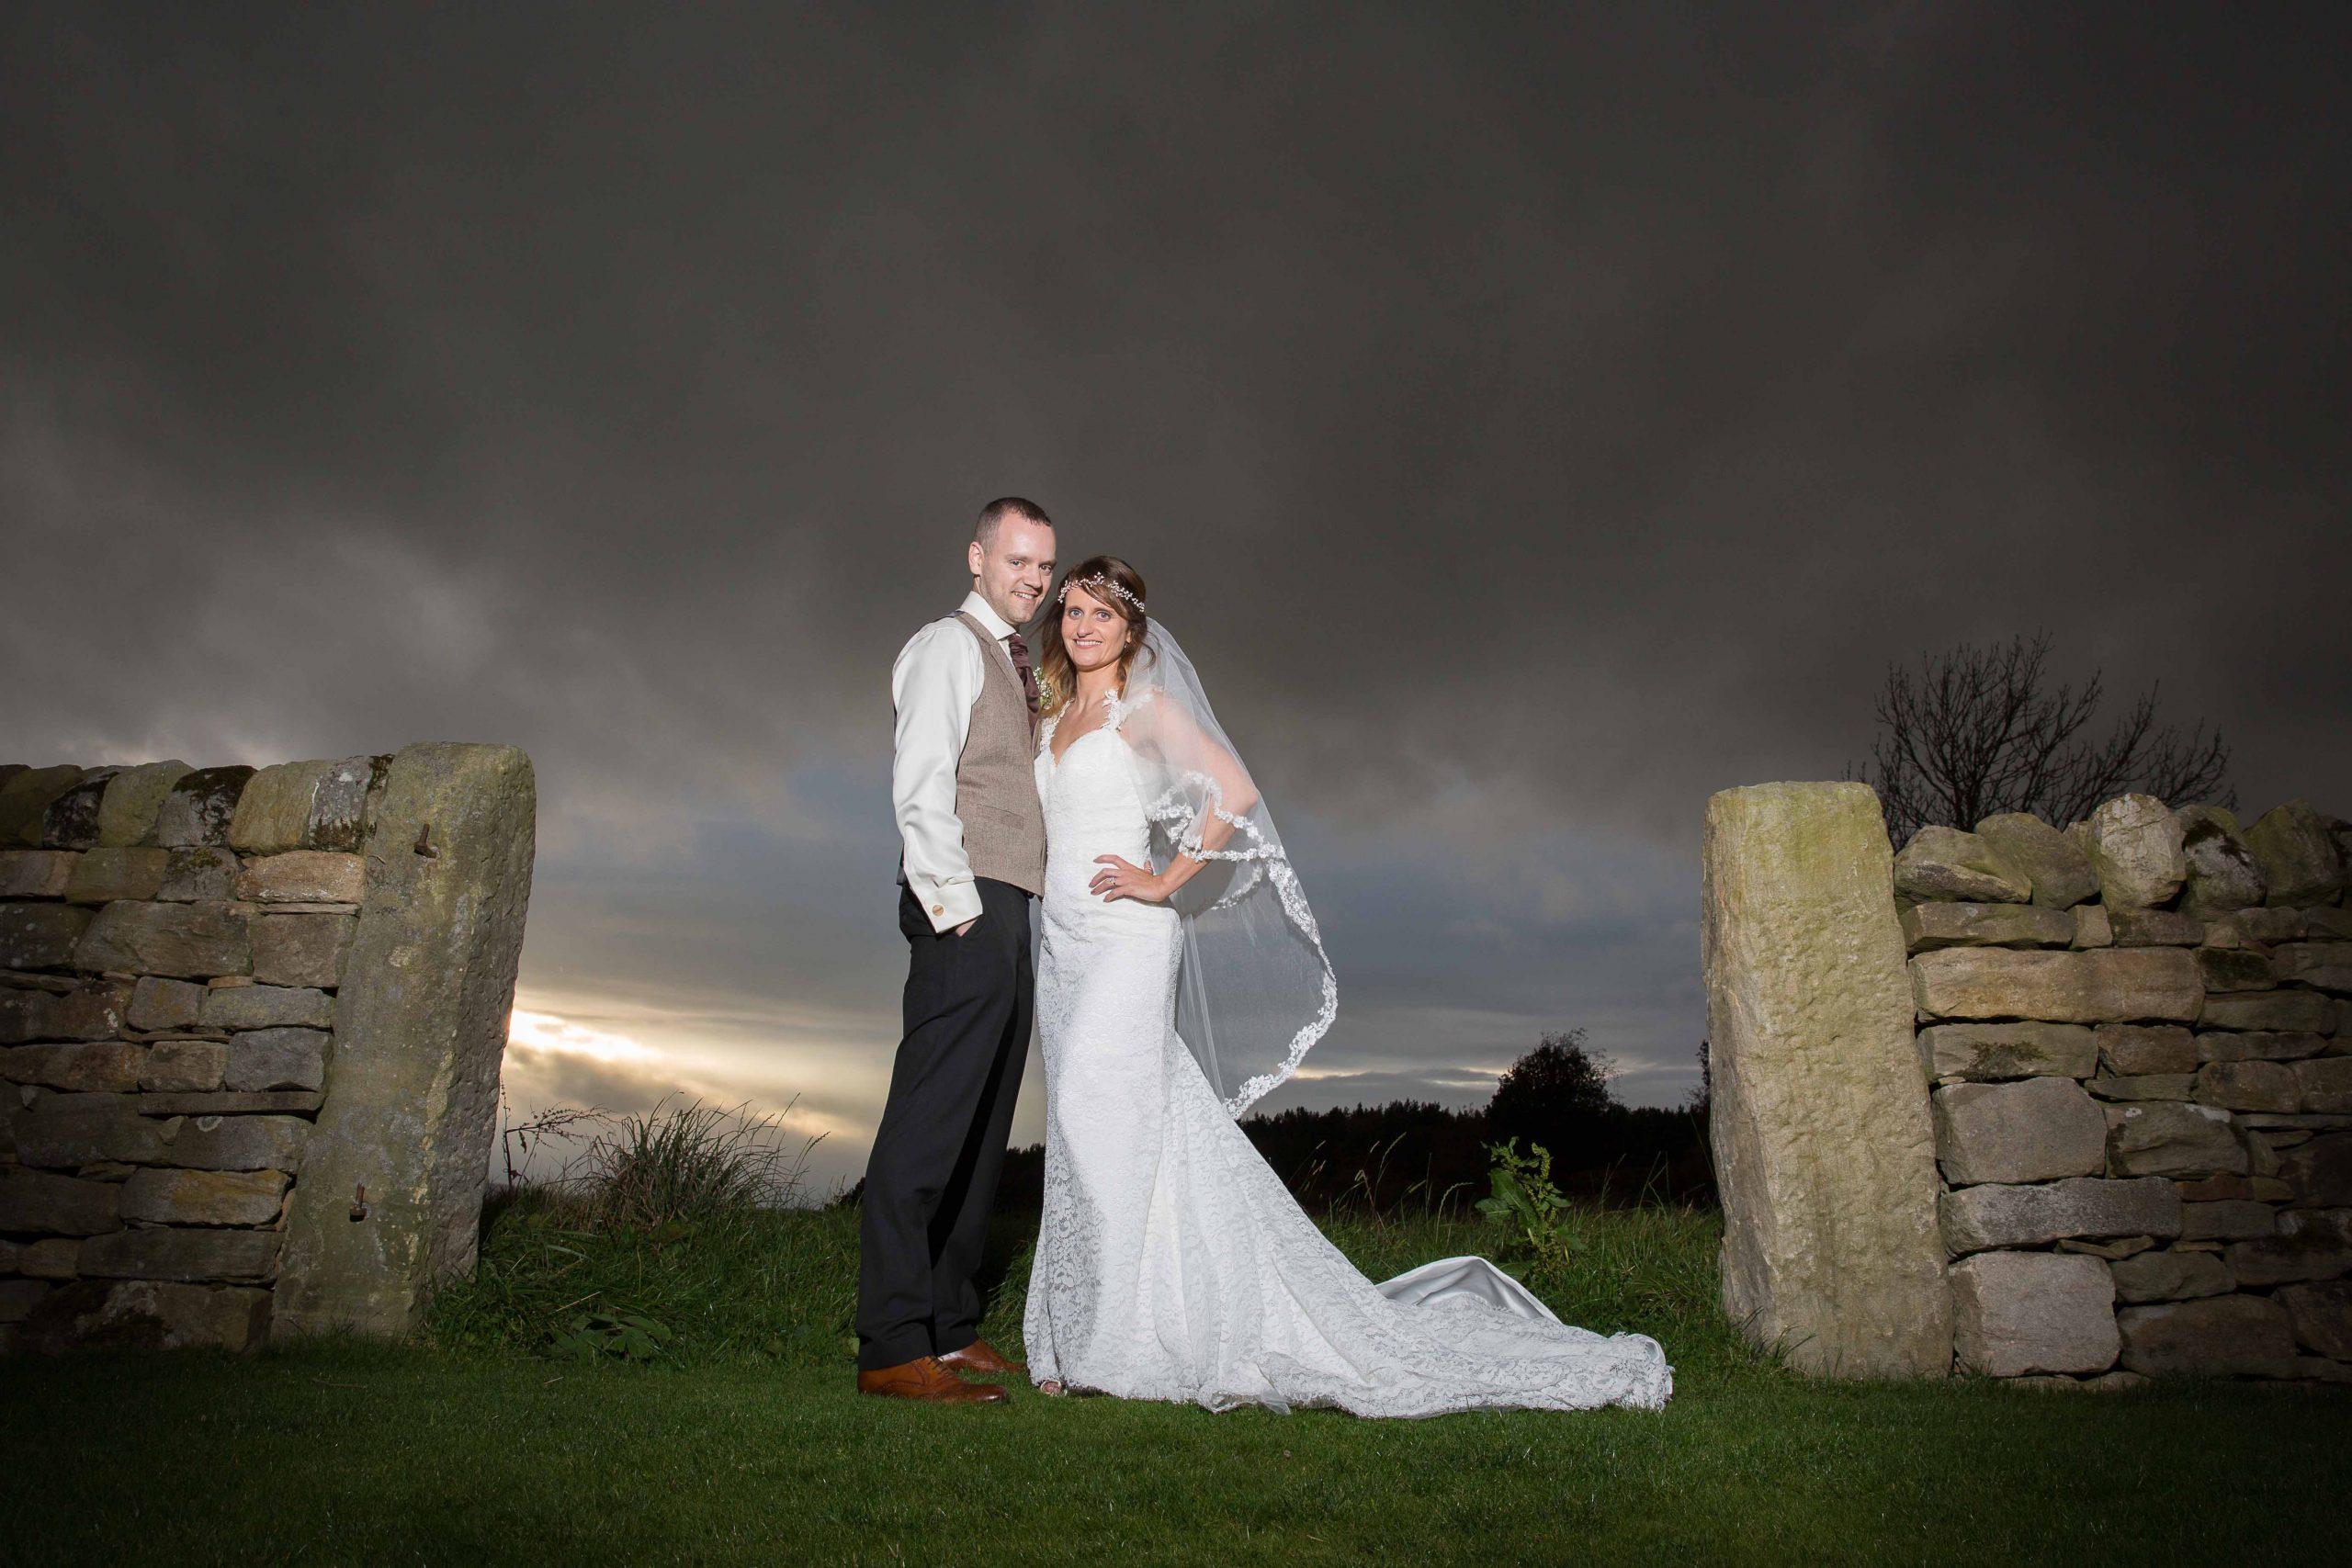 Creative wedding photos by Teardrop Photography at Healey Barn